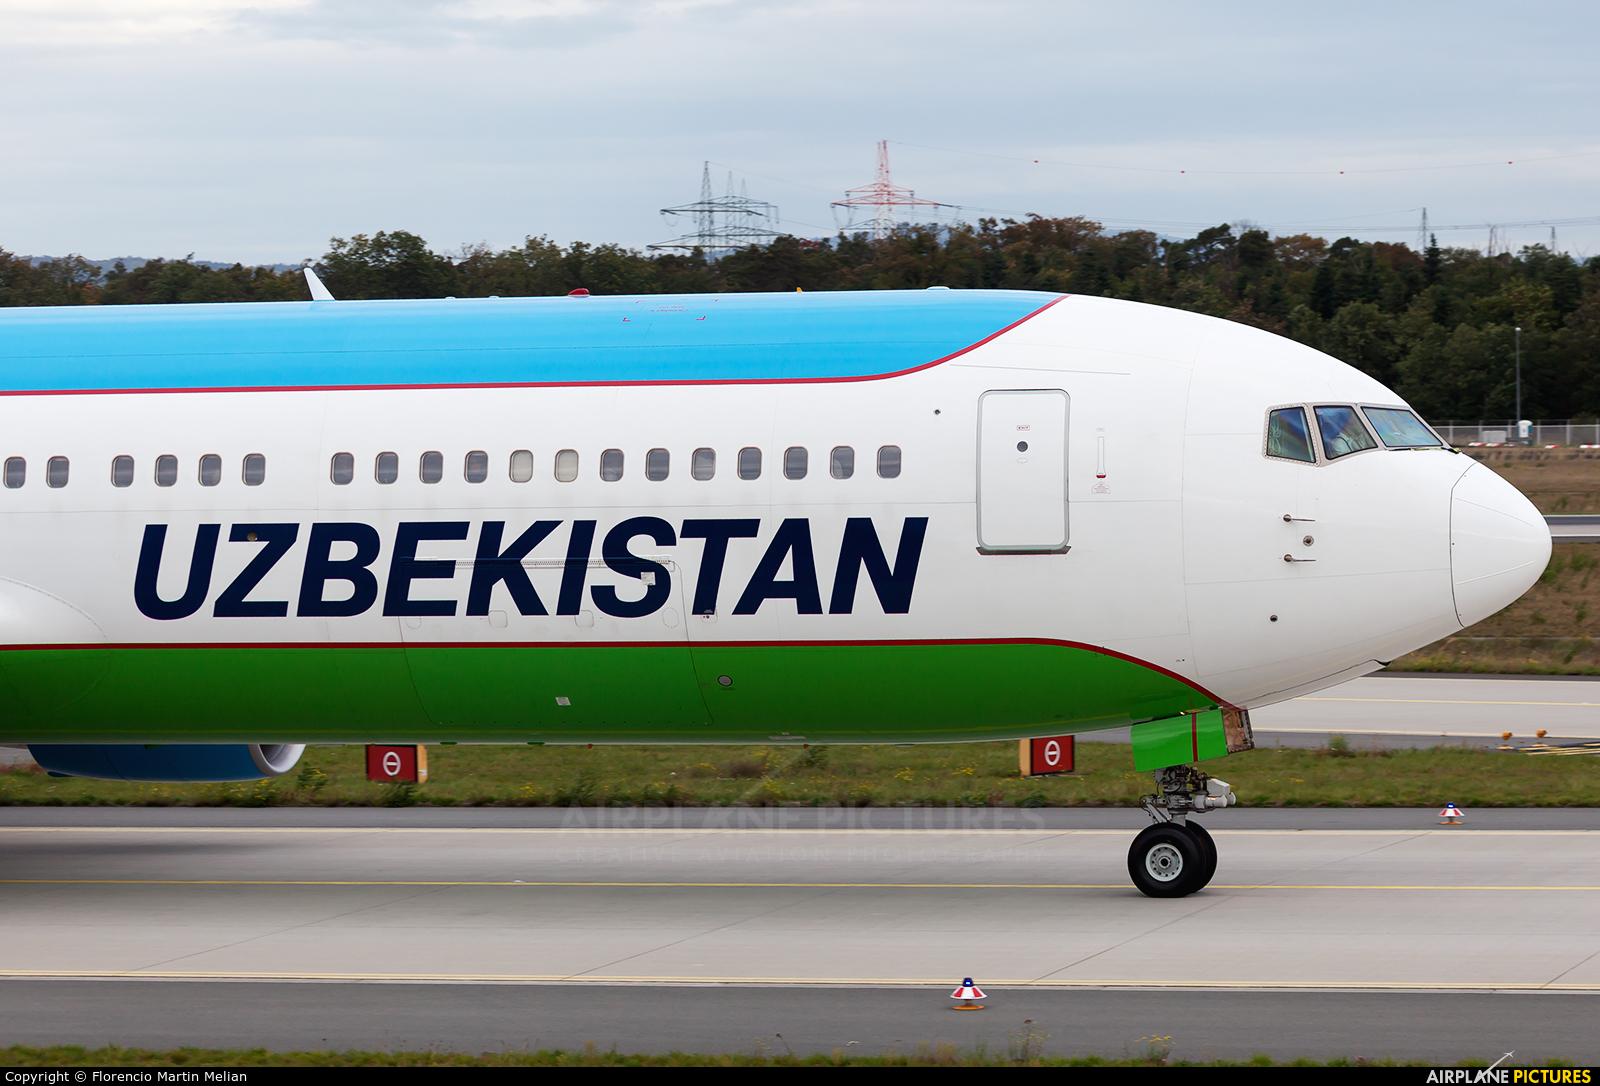 Uzbekistan Airways UK67004 aircraft at Frankfurt